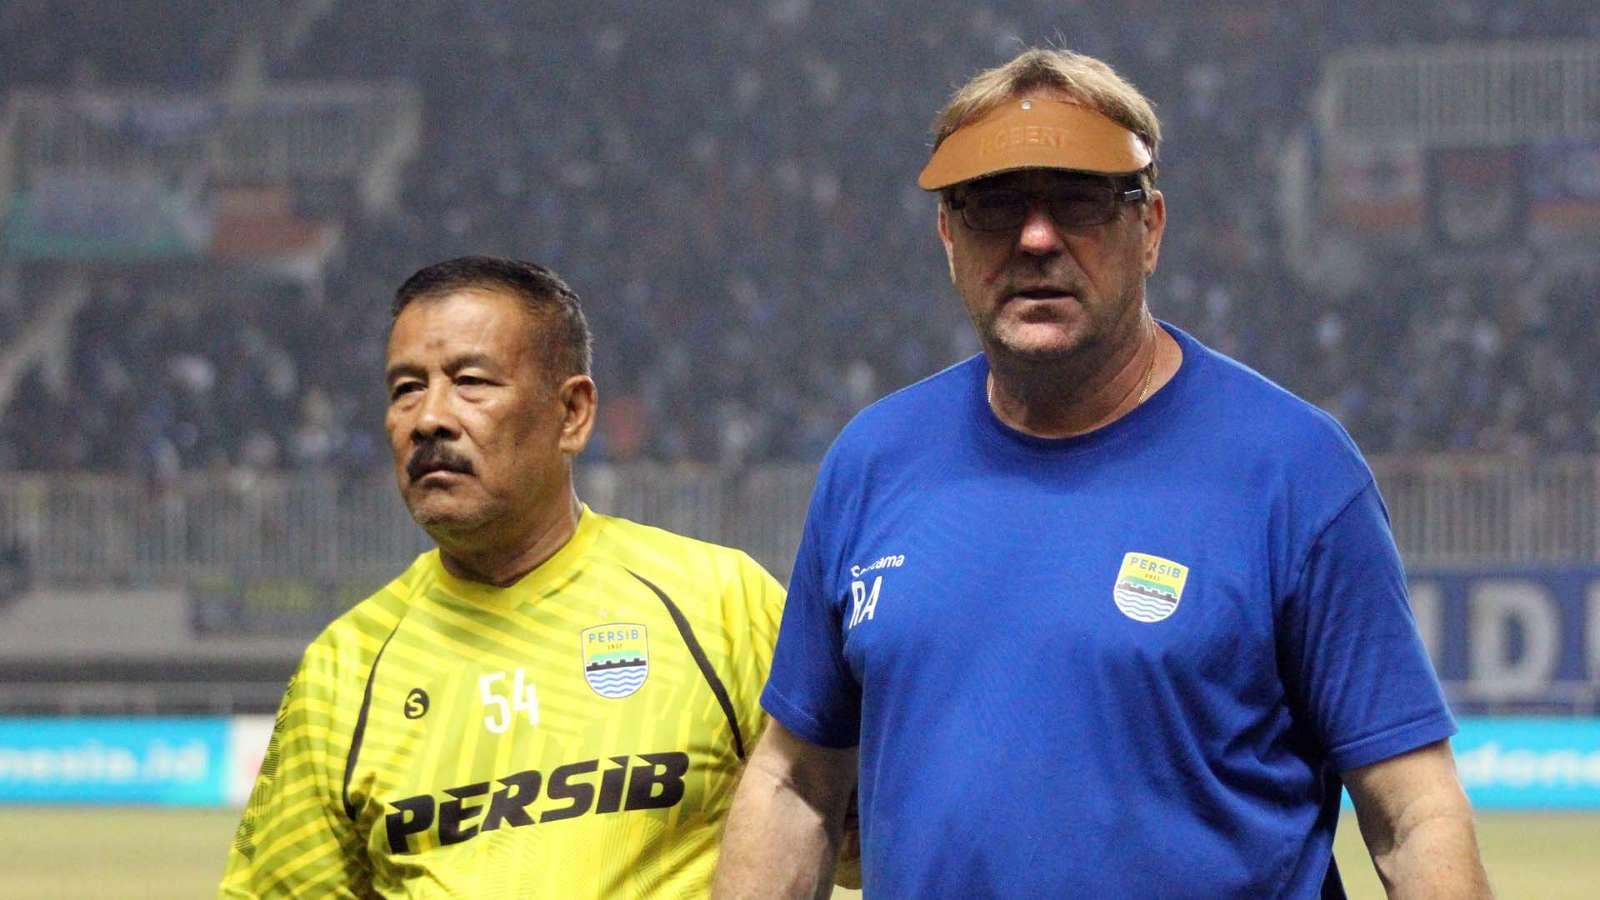 Robert Alberts Yakin Pemain Persib Bandung Tak Akan Kegemukan